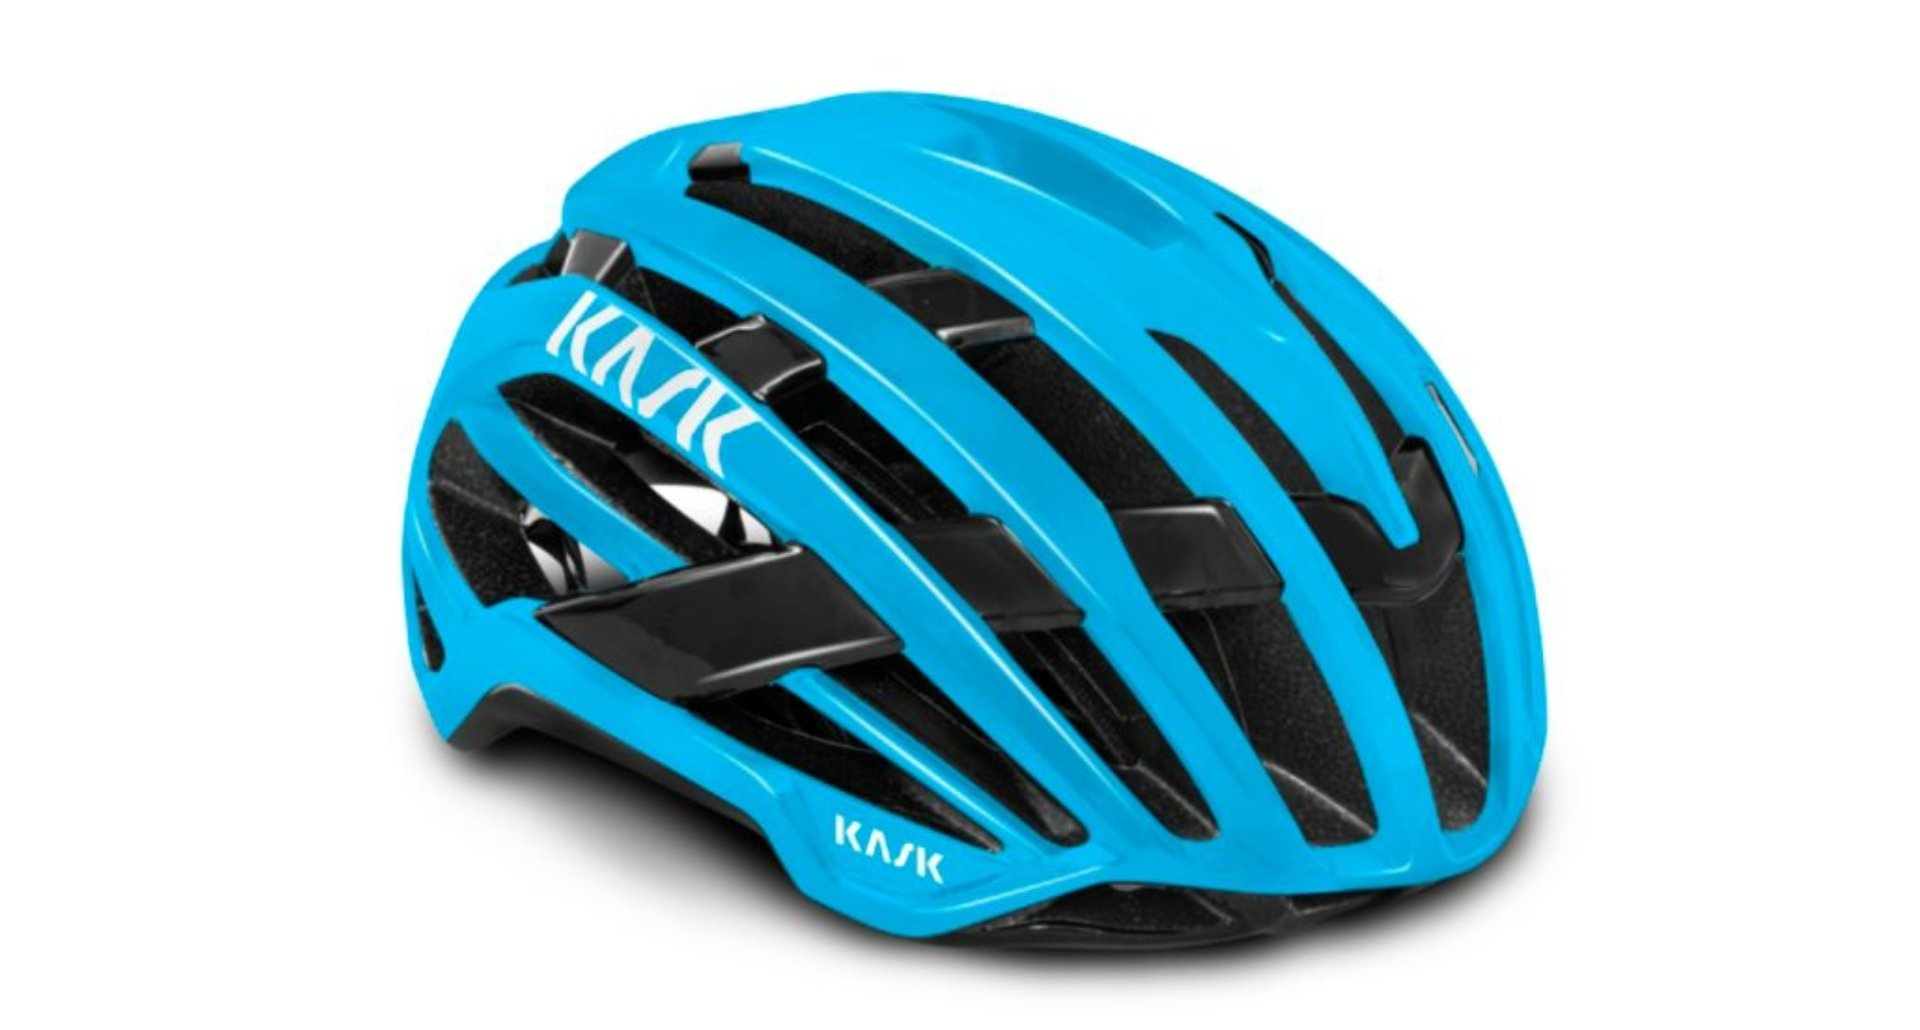 Kask Valegro Helmet, Small, Light Blue